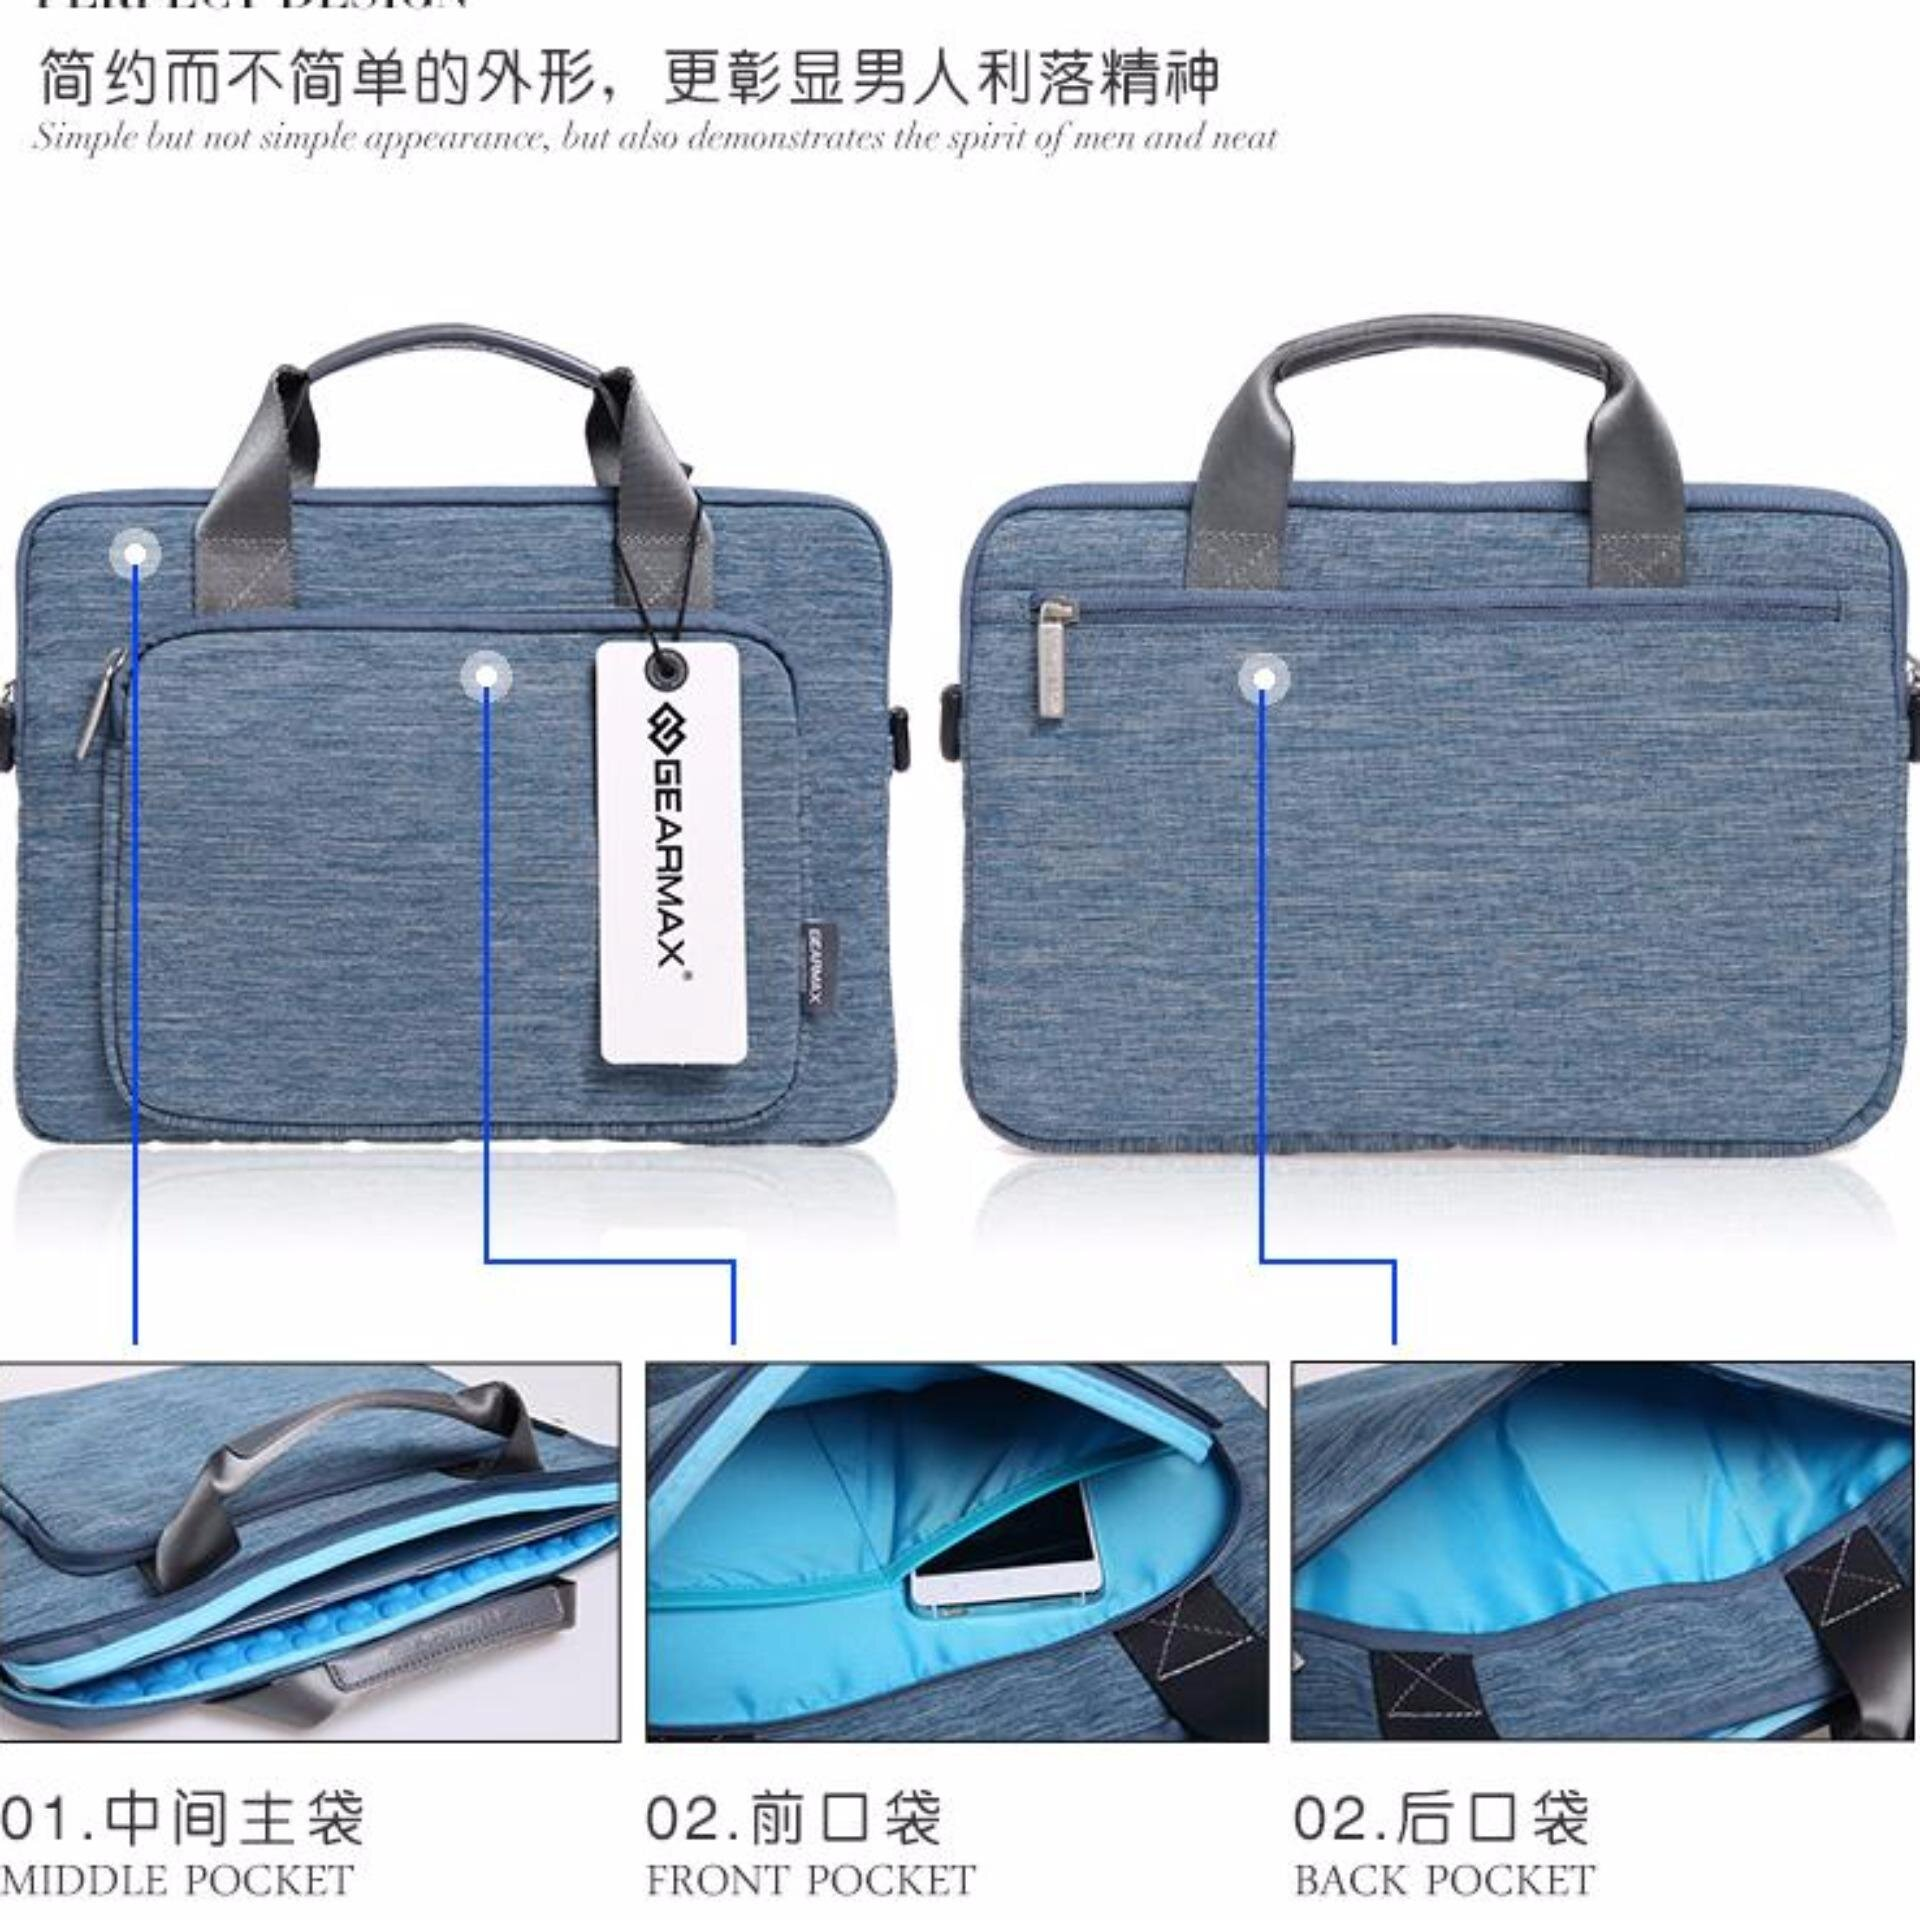 Túi đeo Gearmax cho Macbook M163 giá rẻ